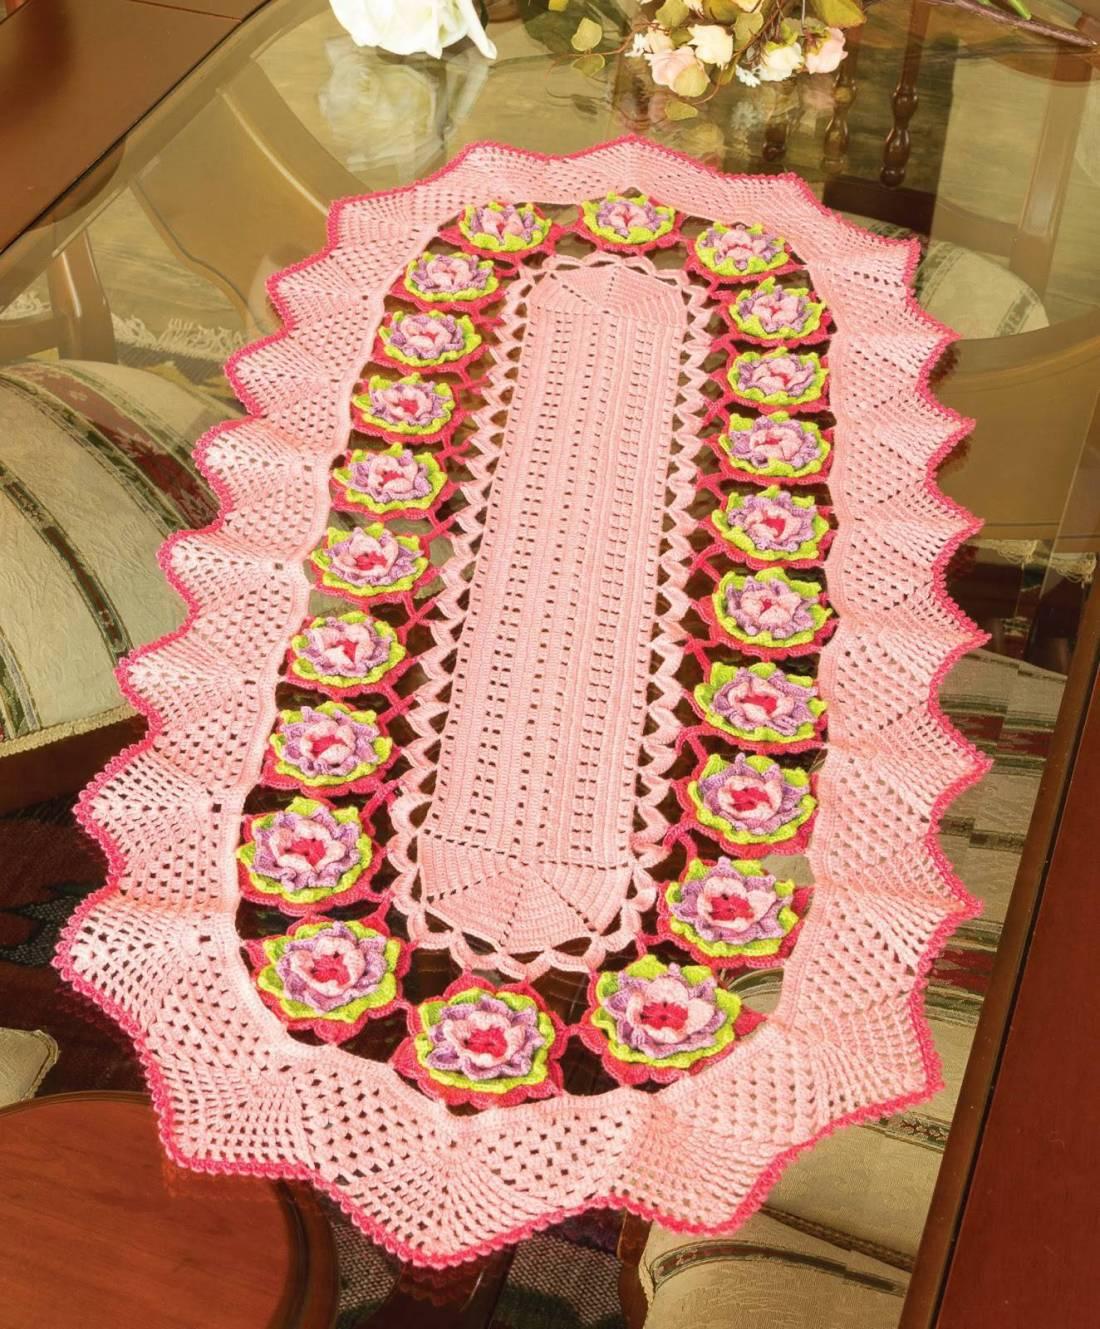 caminho de mesa de croche rosa